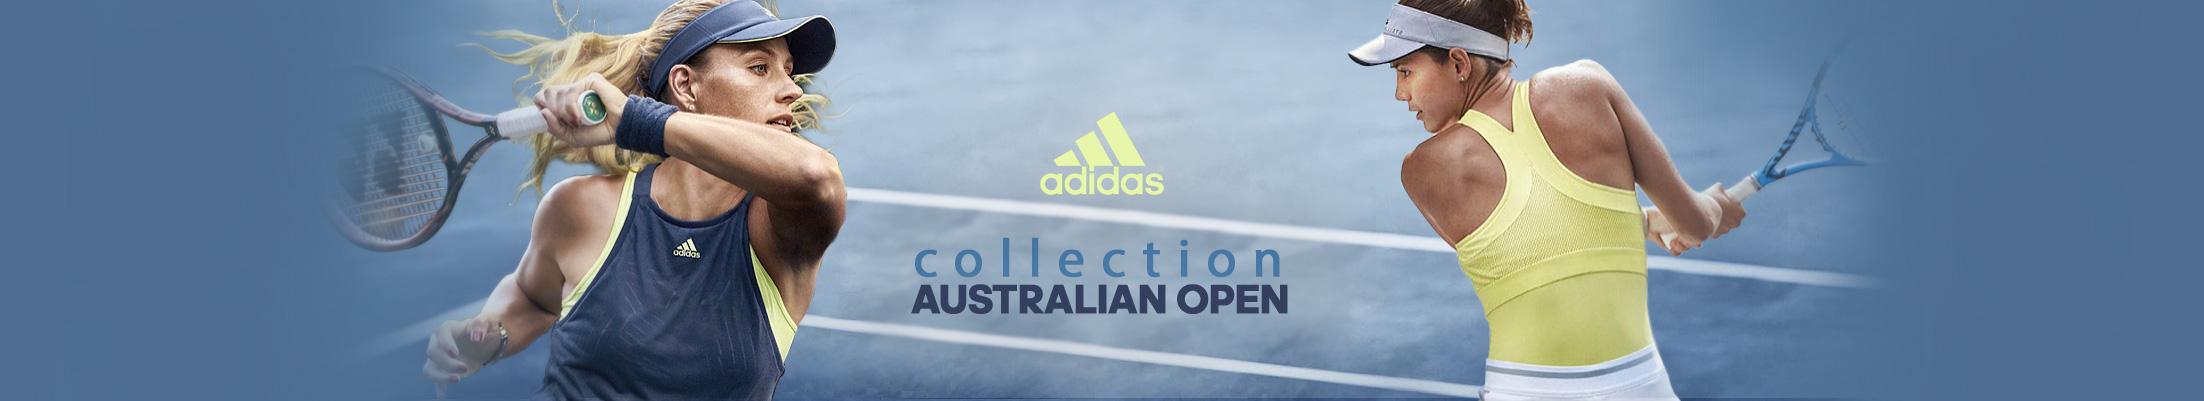 Adidas Australian Open Collection